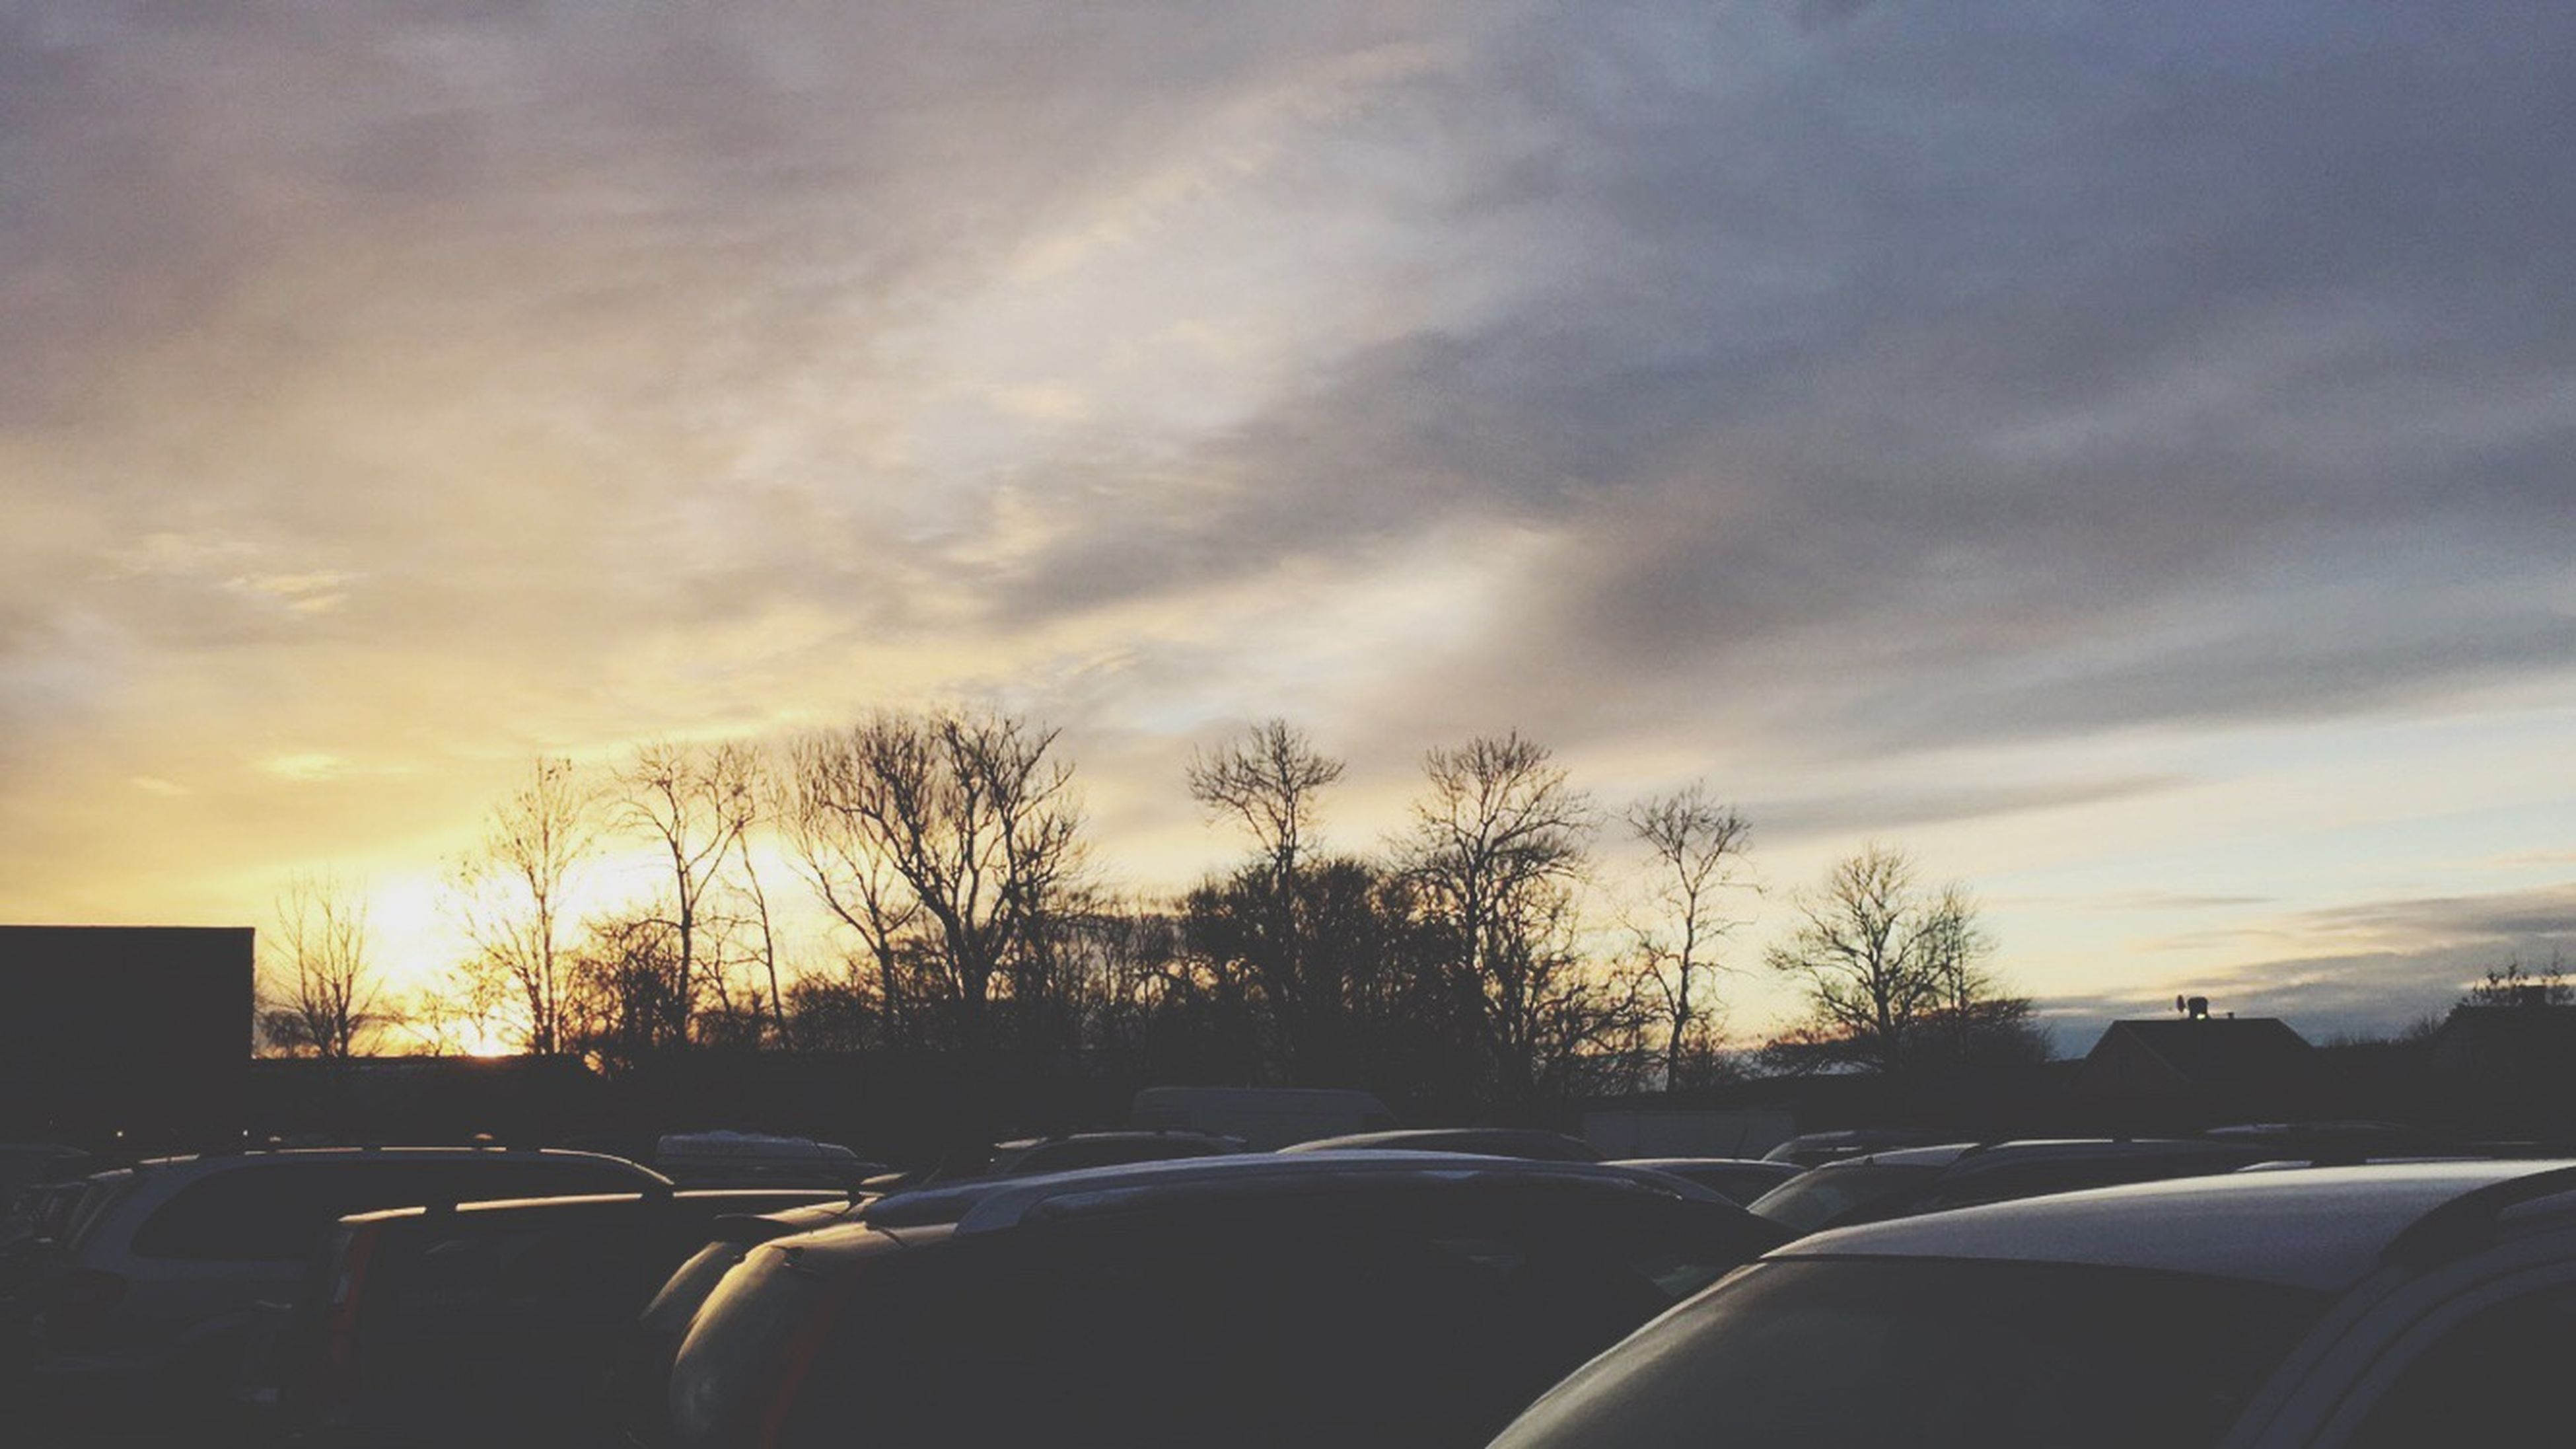 sunset, transportation, car, land vehicle, sky, cloud - sky, mode of transport, silhouette, road, tree, cloudy, street, bare tree, cloud, orange color, nature, beauty in nature, scenics, sun, outdoors